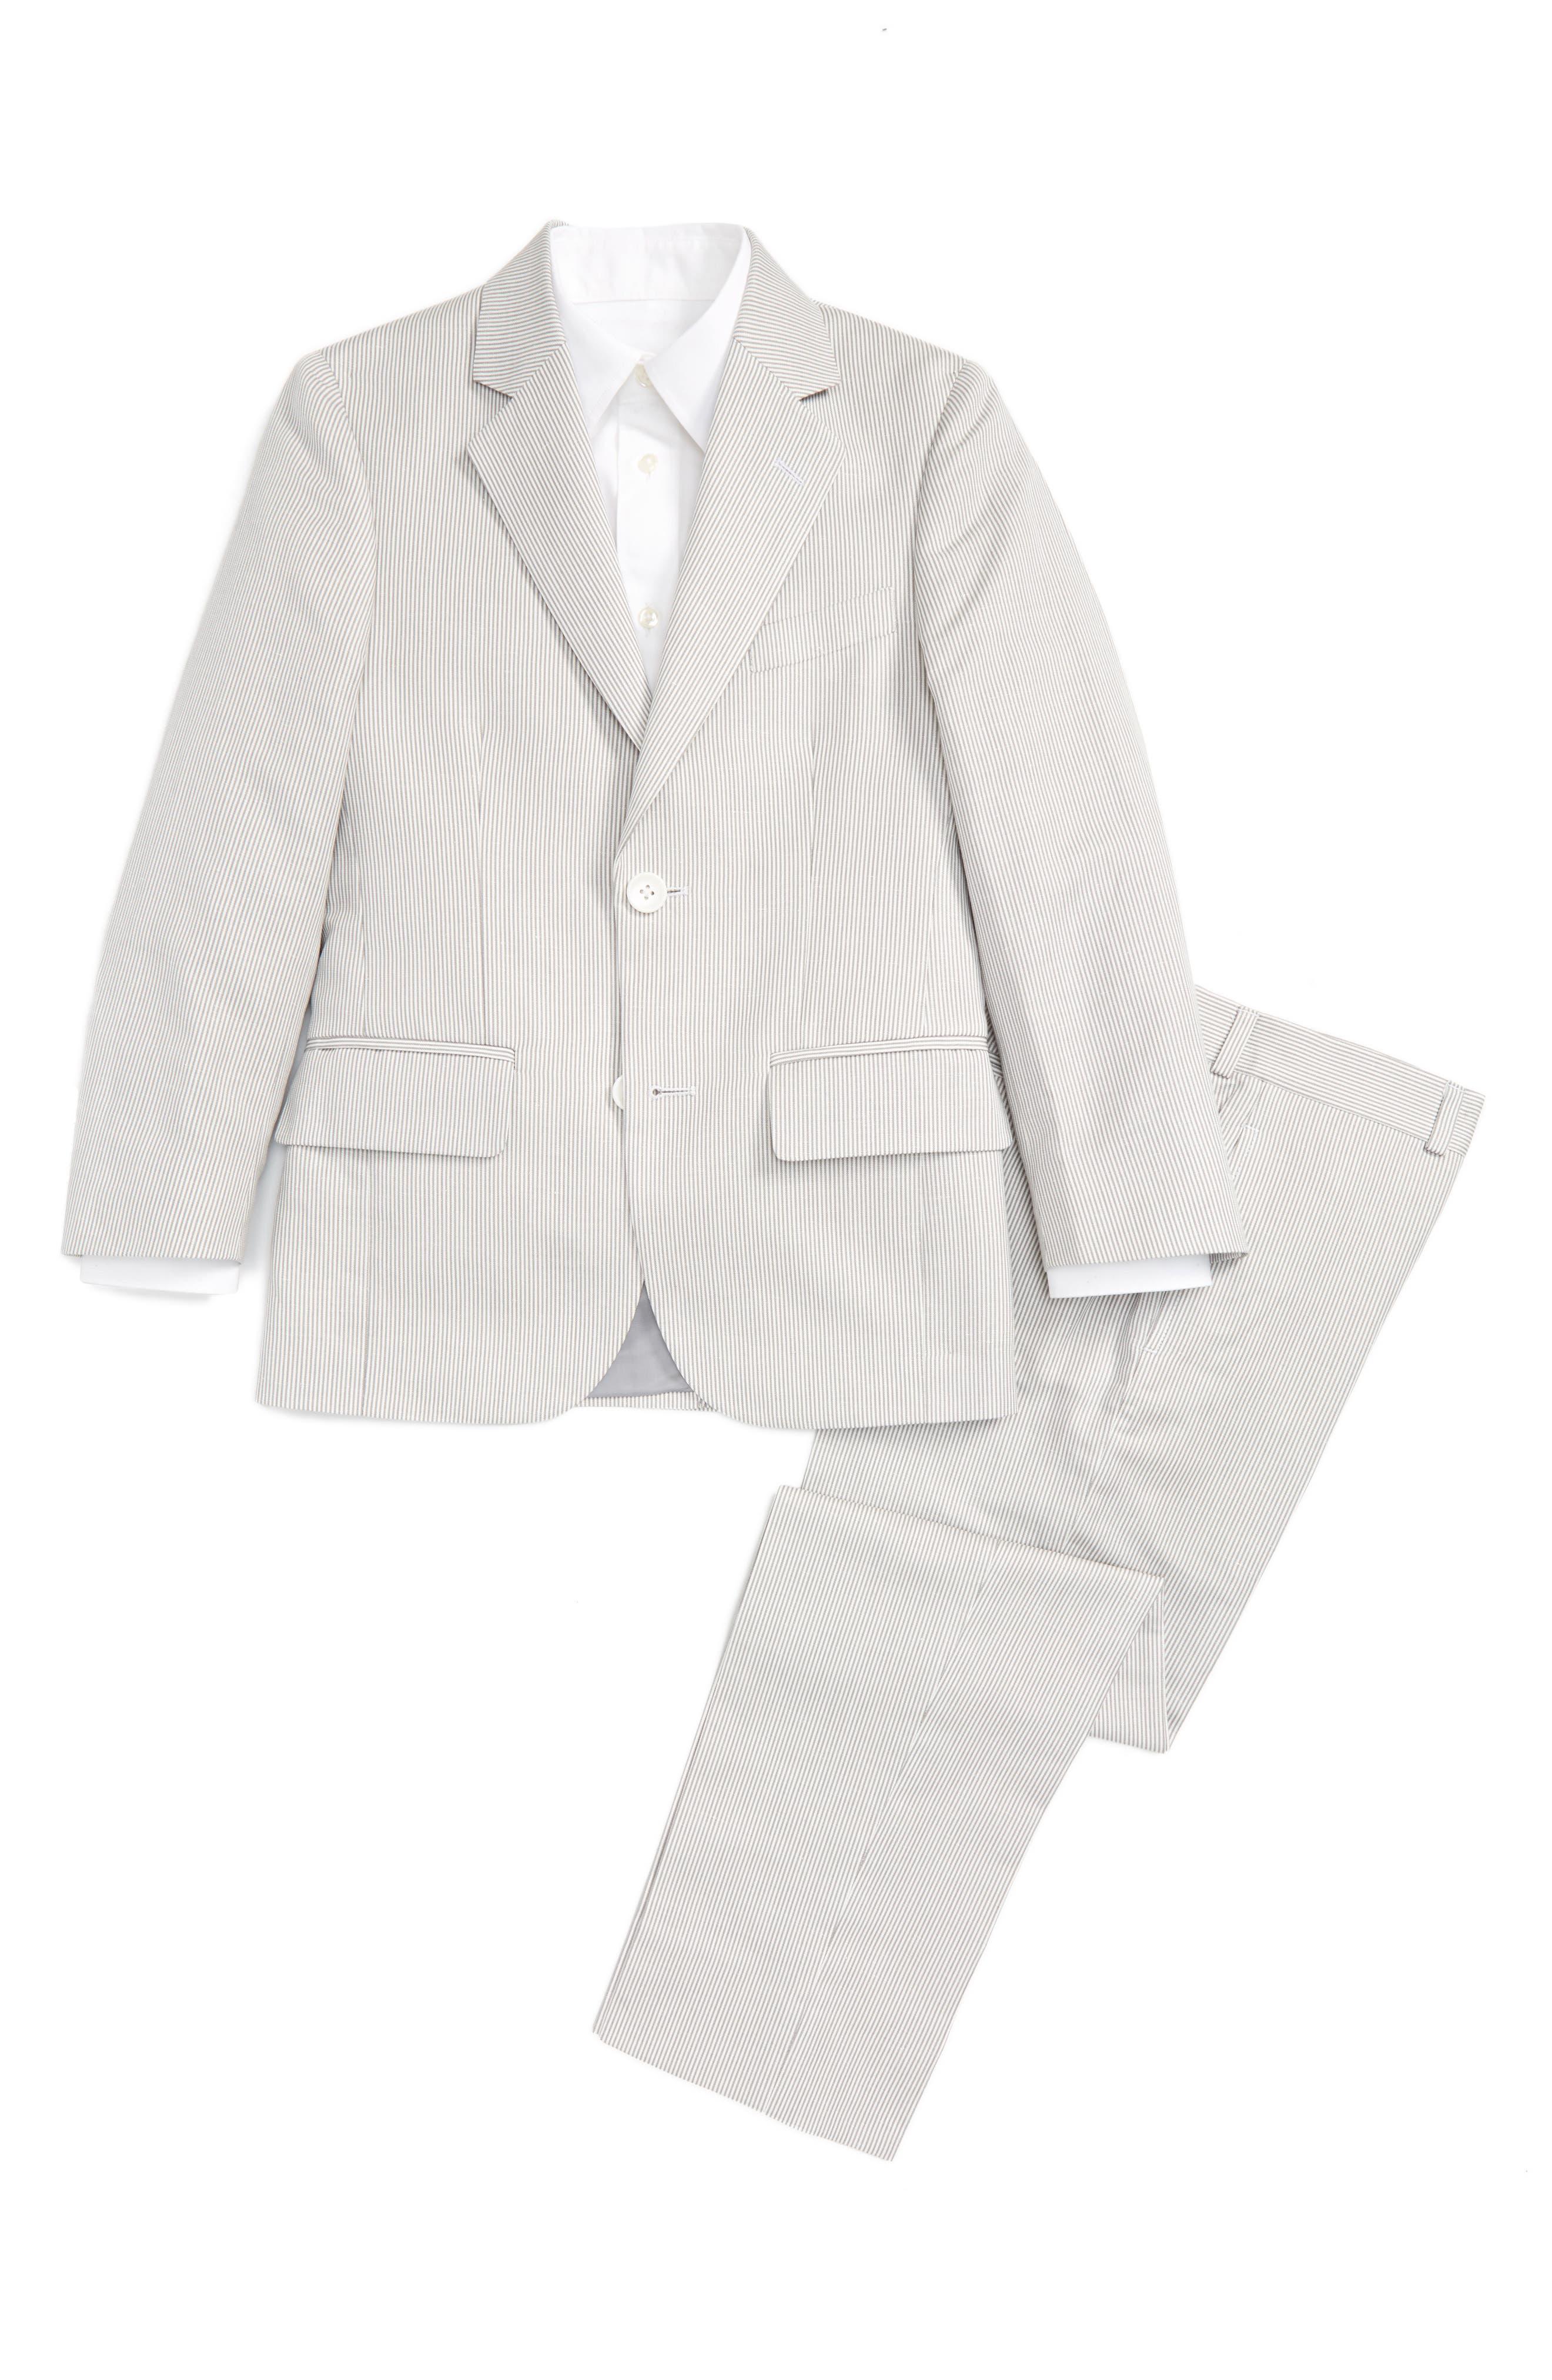 Main Image - JB Jr Stripe Cotton & Linen Sport Coat (Big Boys)